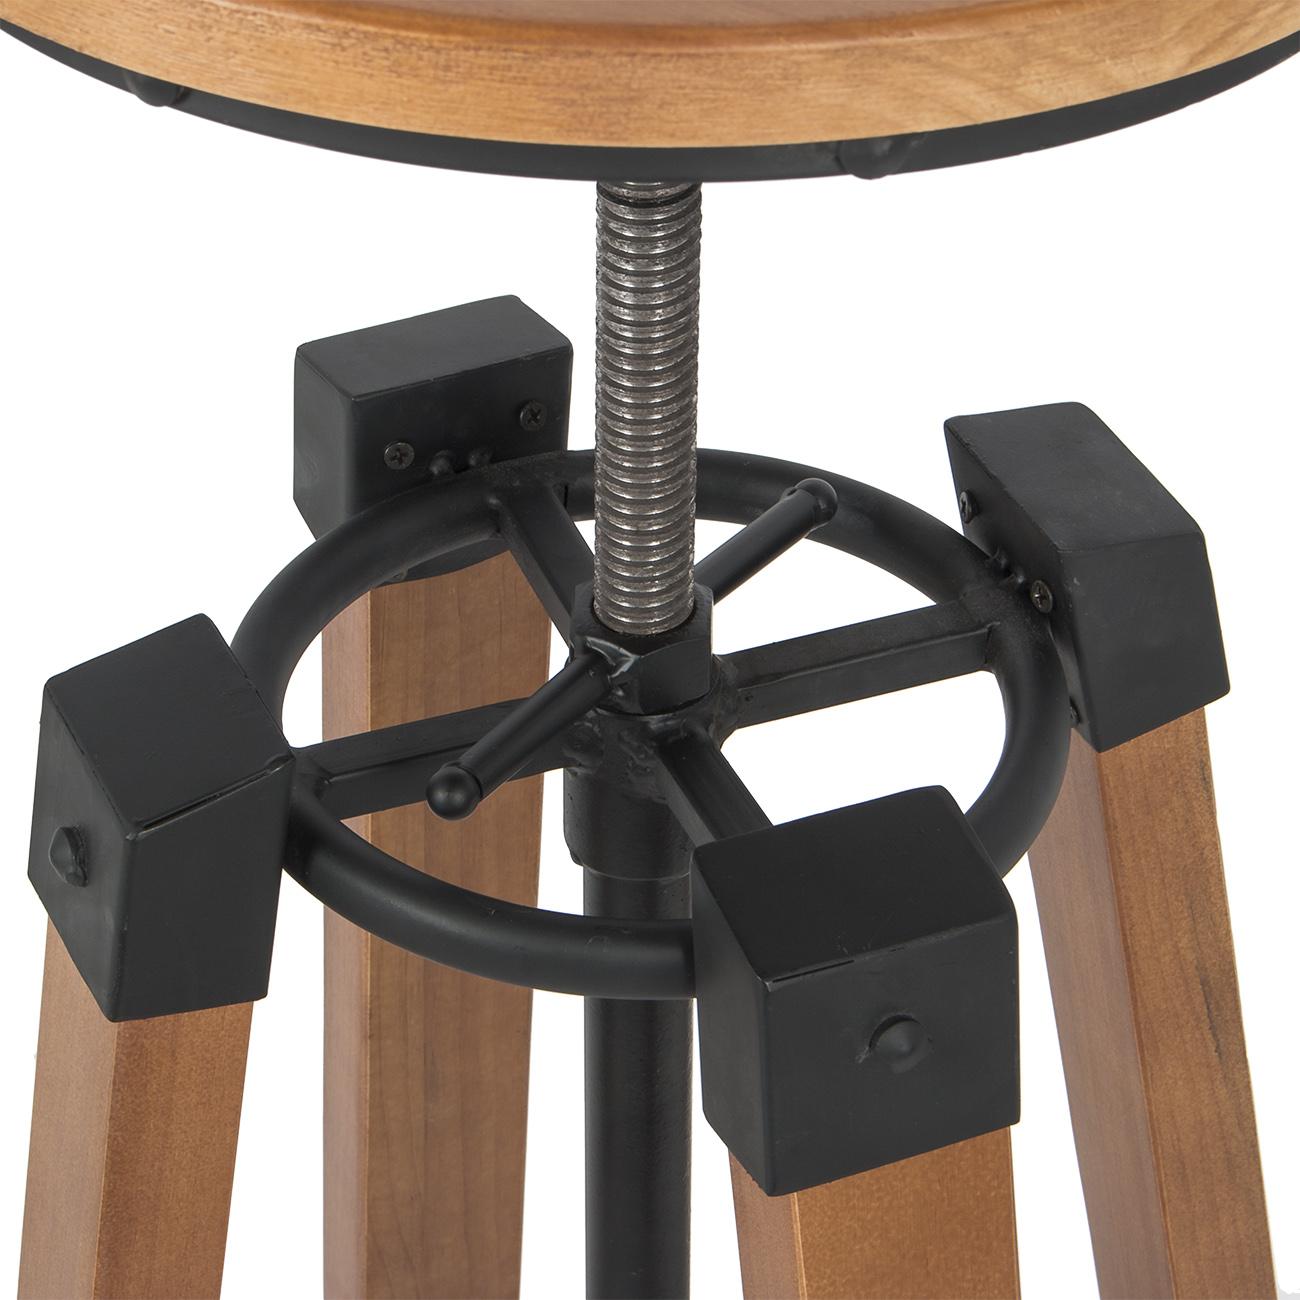 Industrial Bar Stools Swivel Wood Vintage Adjustable Counter Seat Height New Ebay